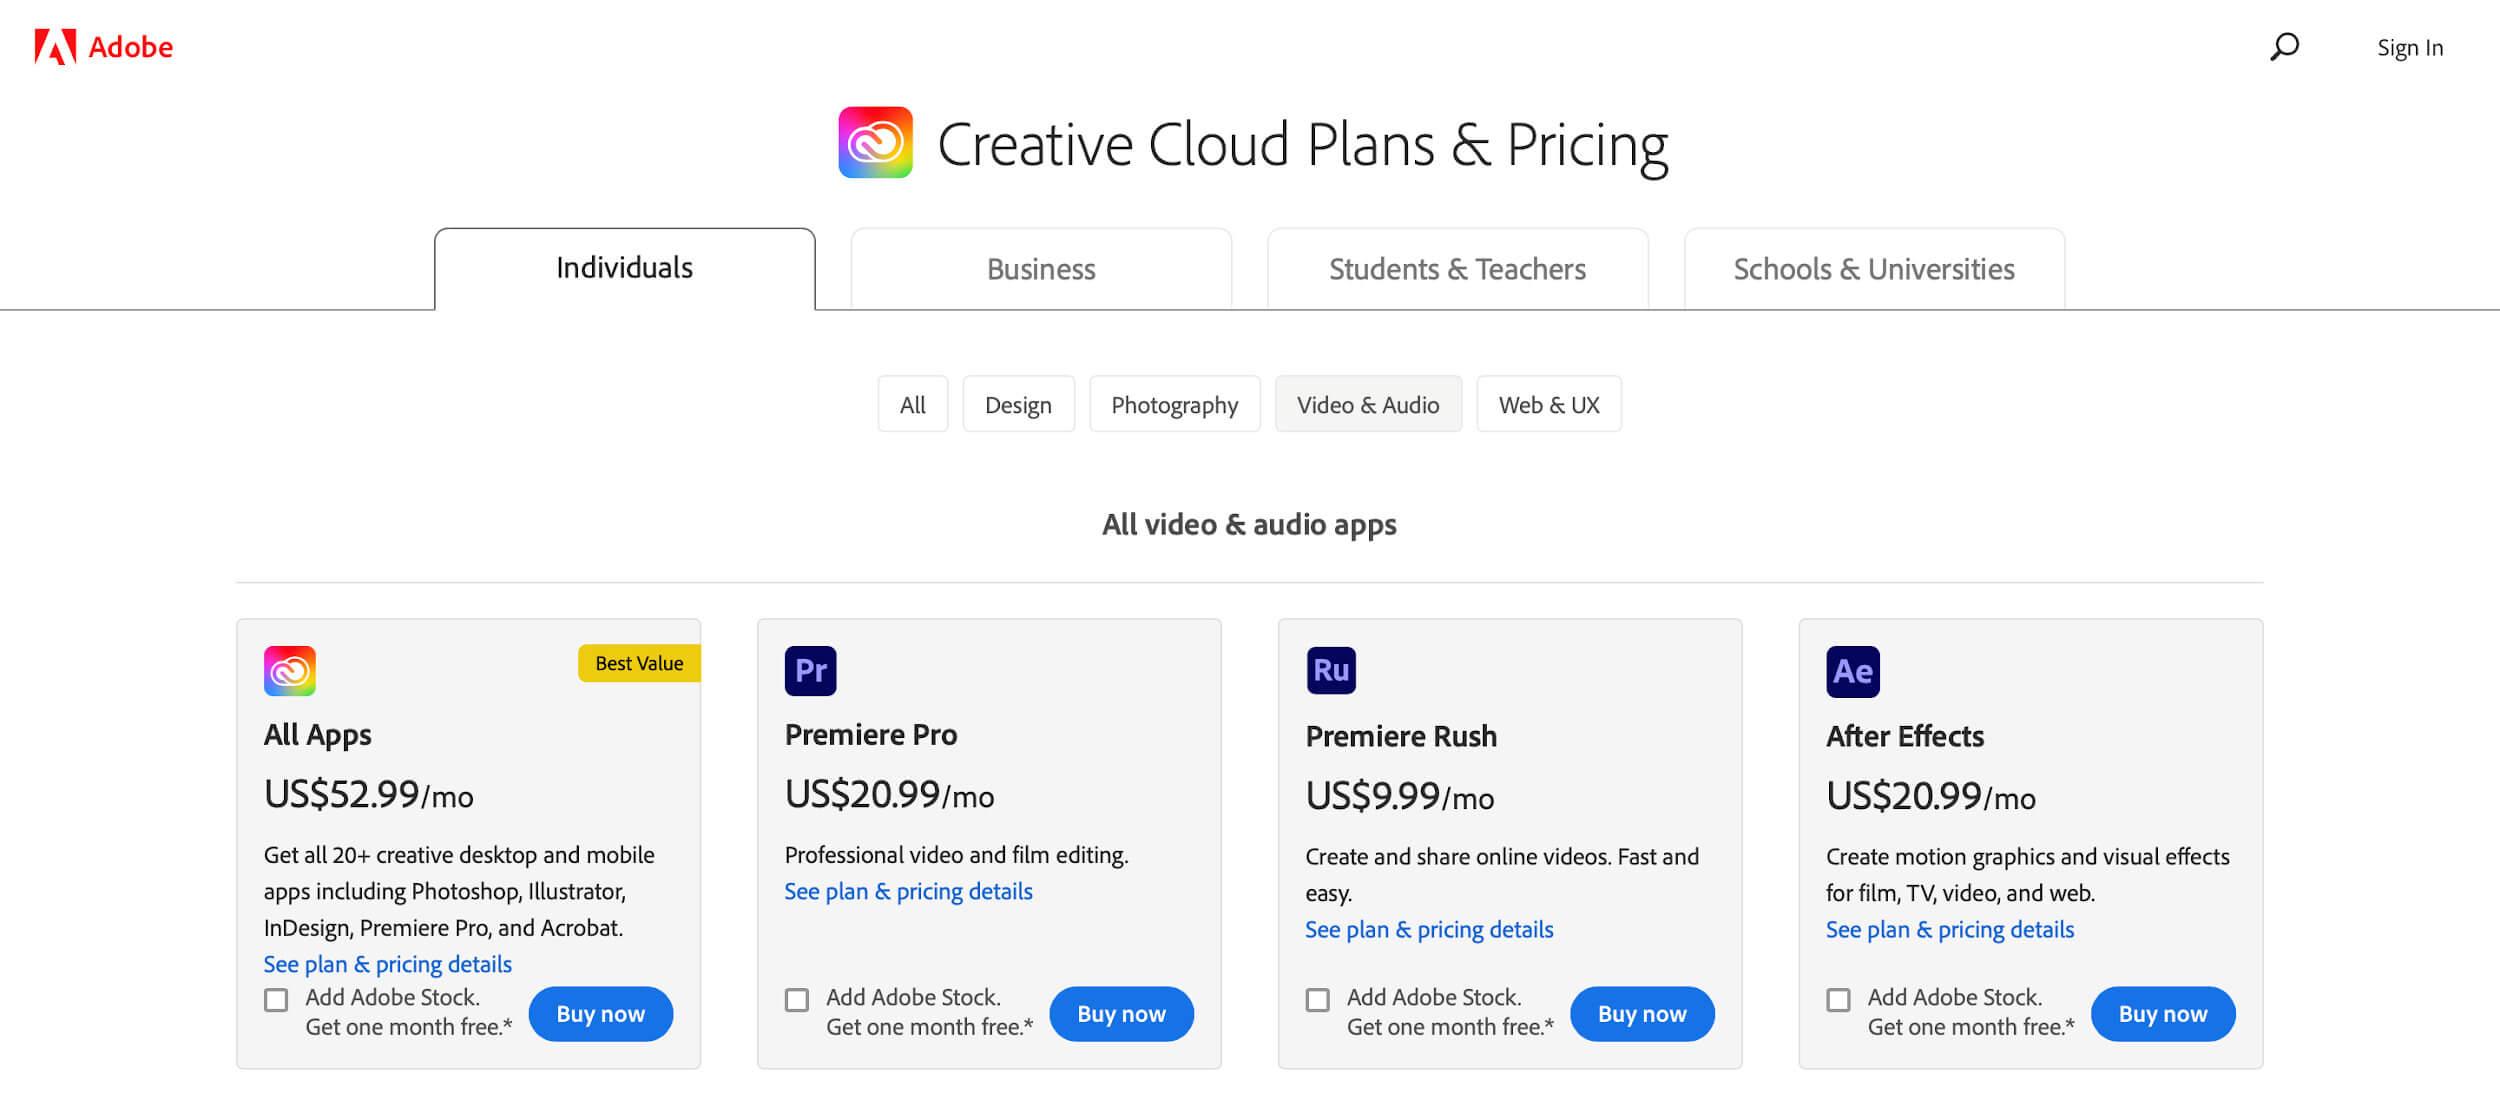 Adobe Premiere Pro vs Final Cut Pro X - Creative Cloud Pricing